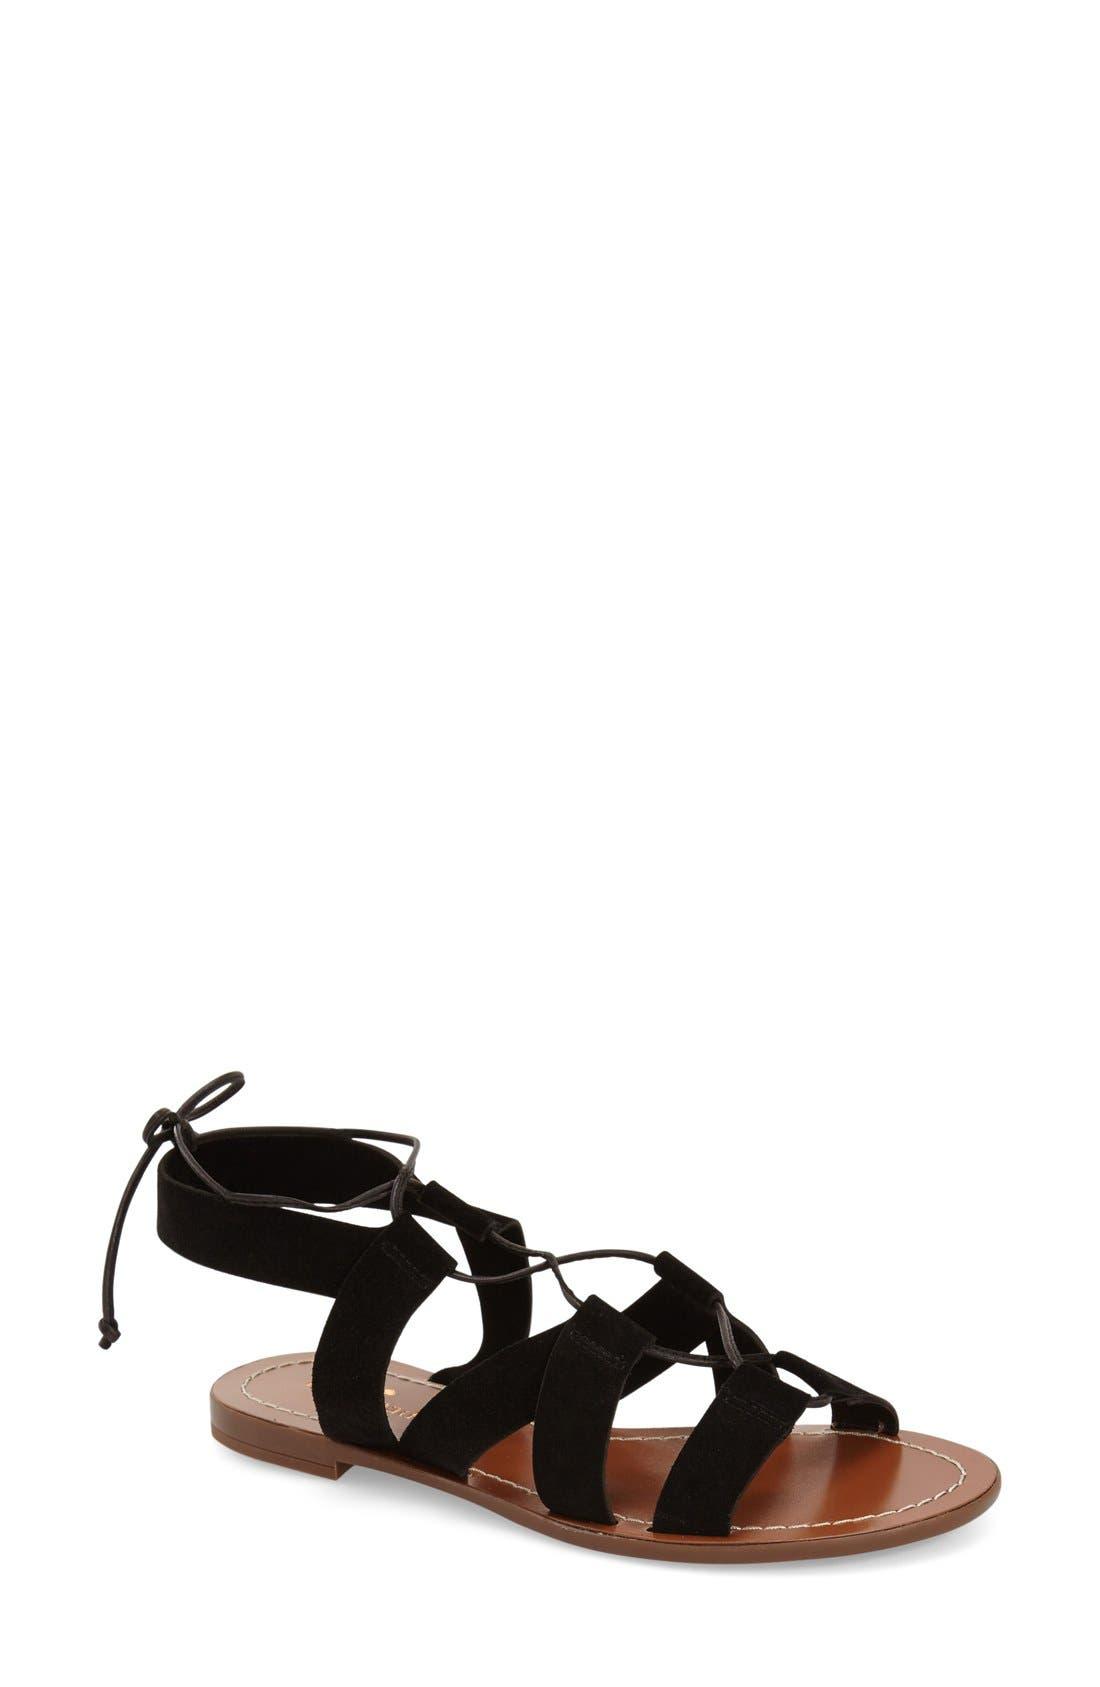 Main Image - kate spade new york 'suno' sandal (Women)